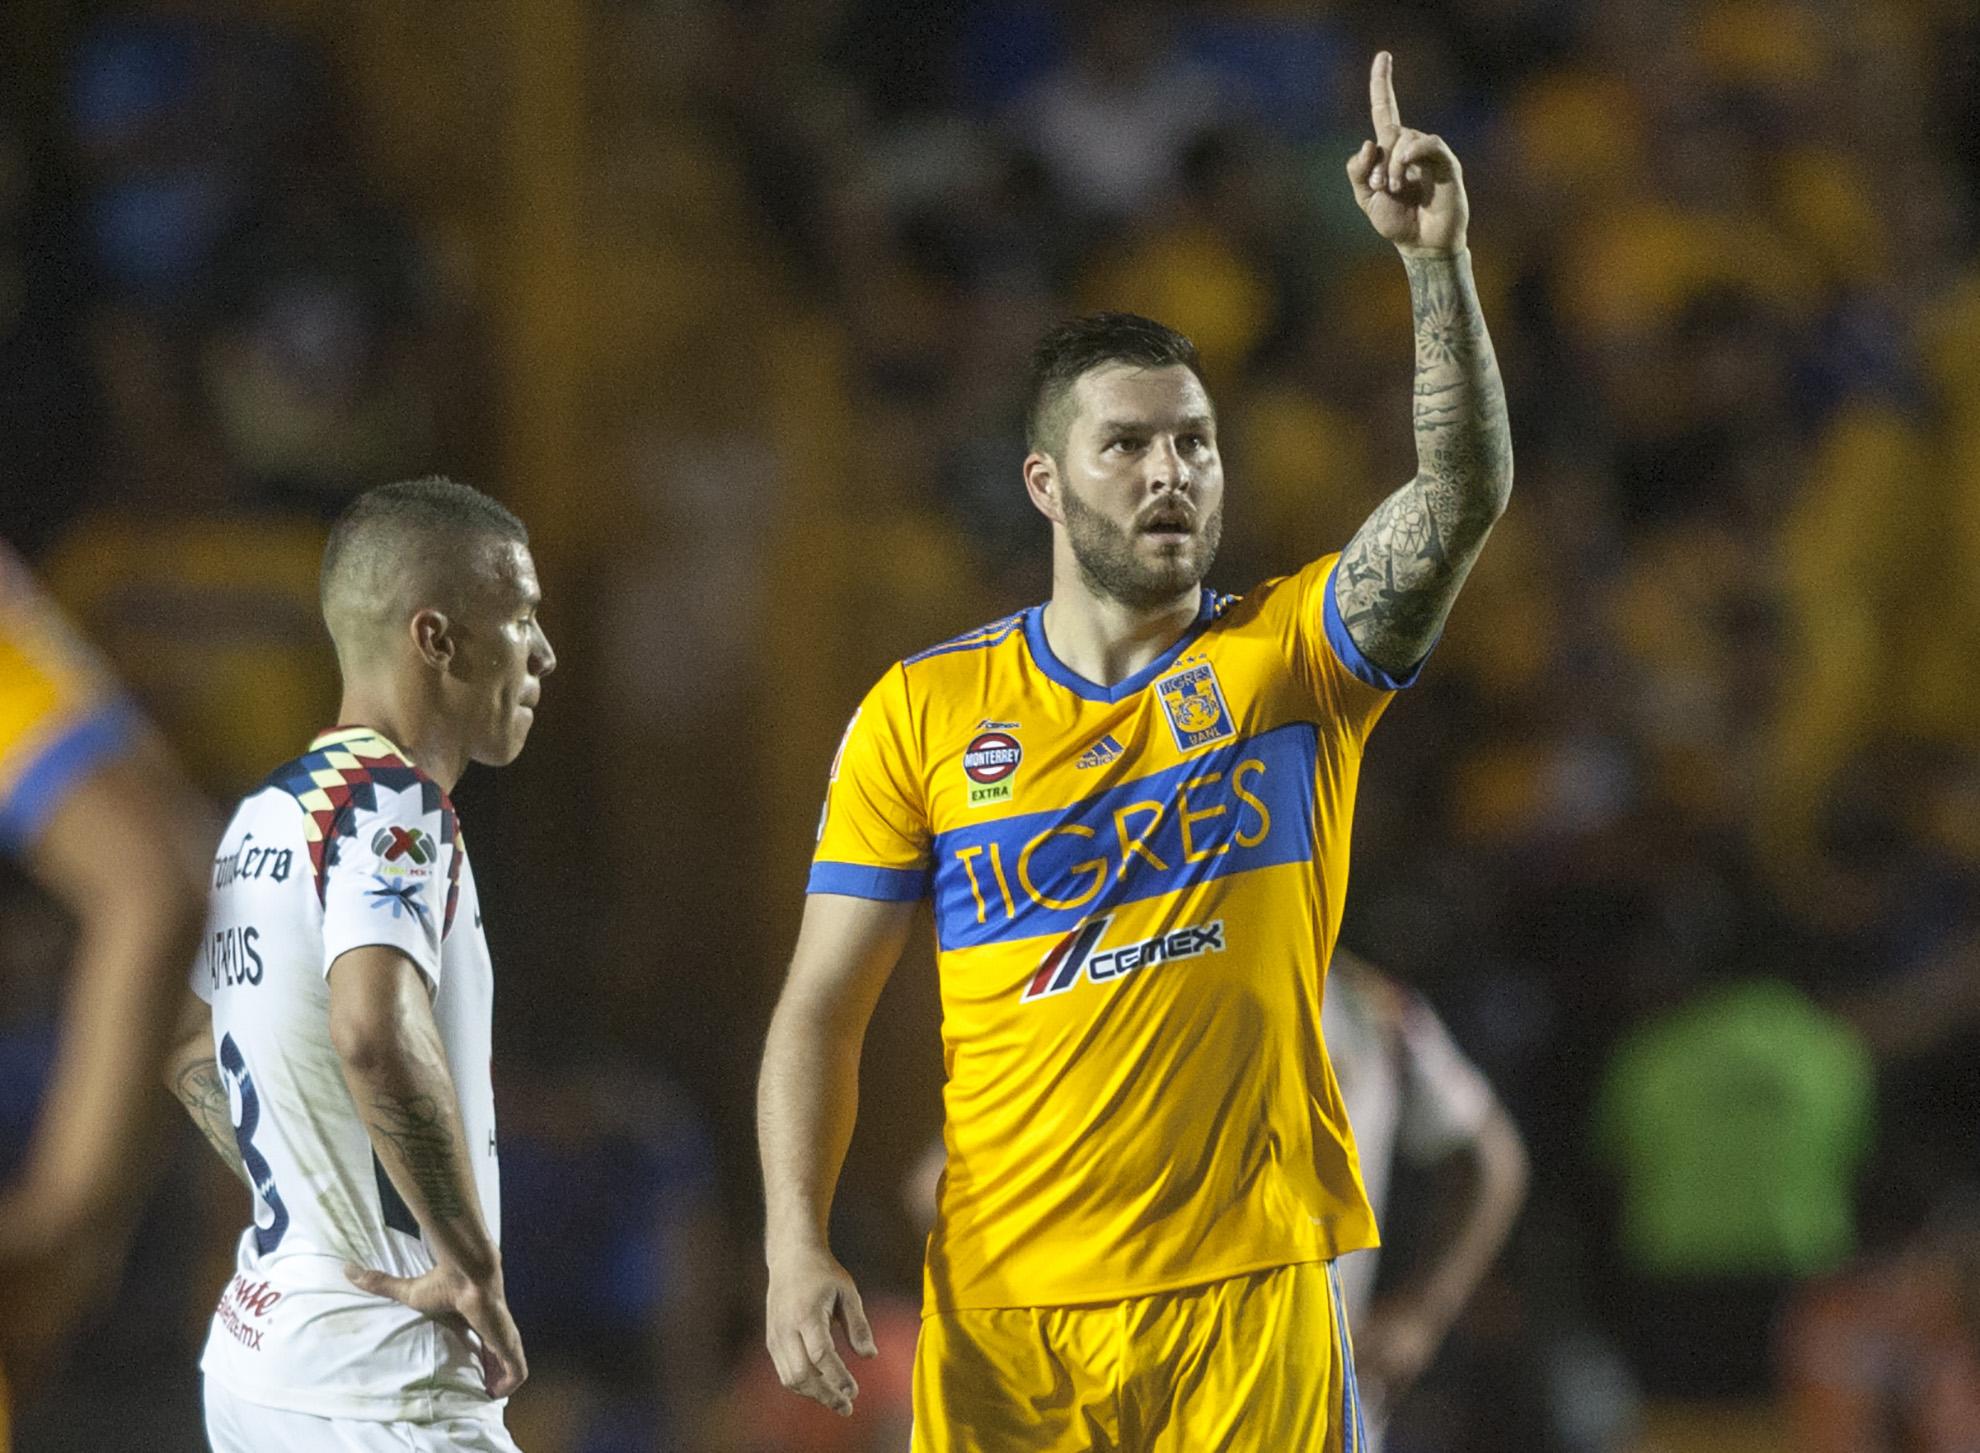 Goles franceses y anulado roban show en Tigres-América